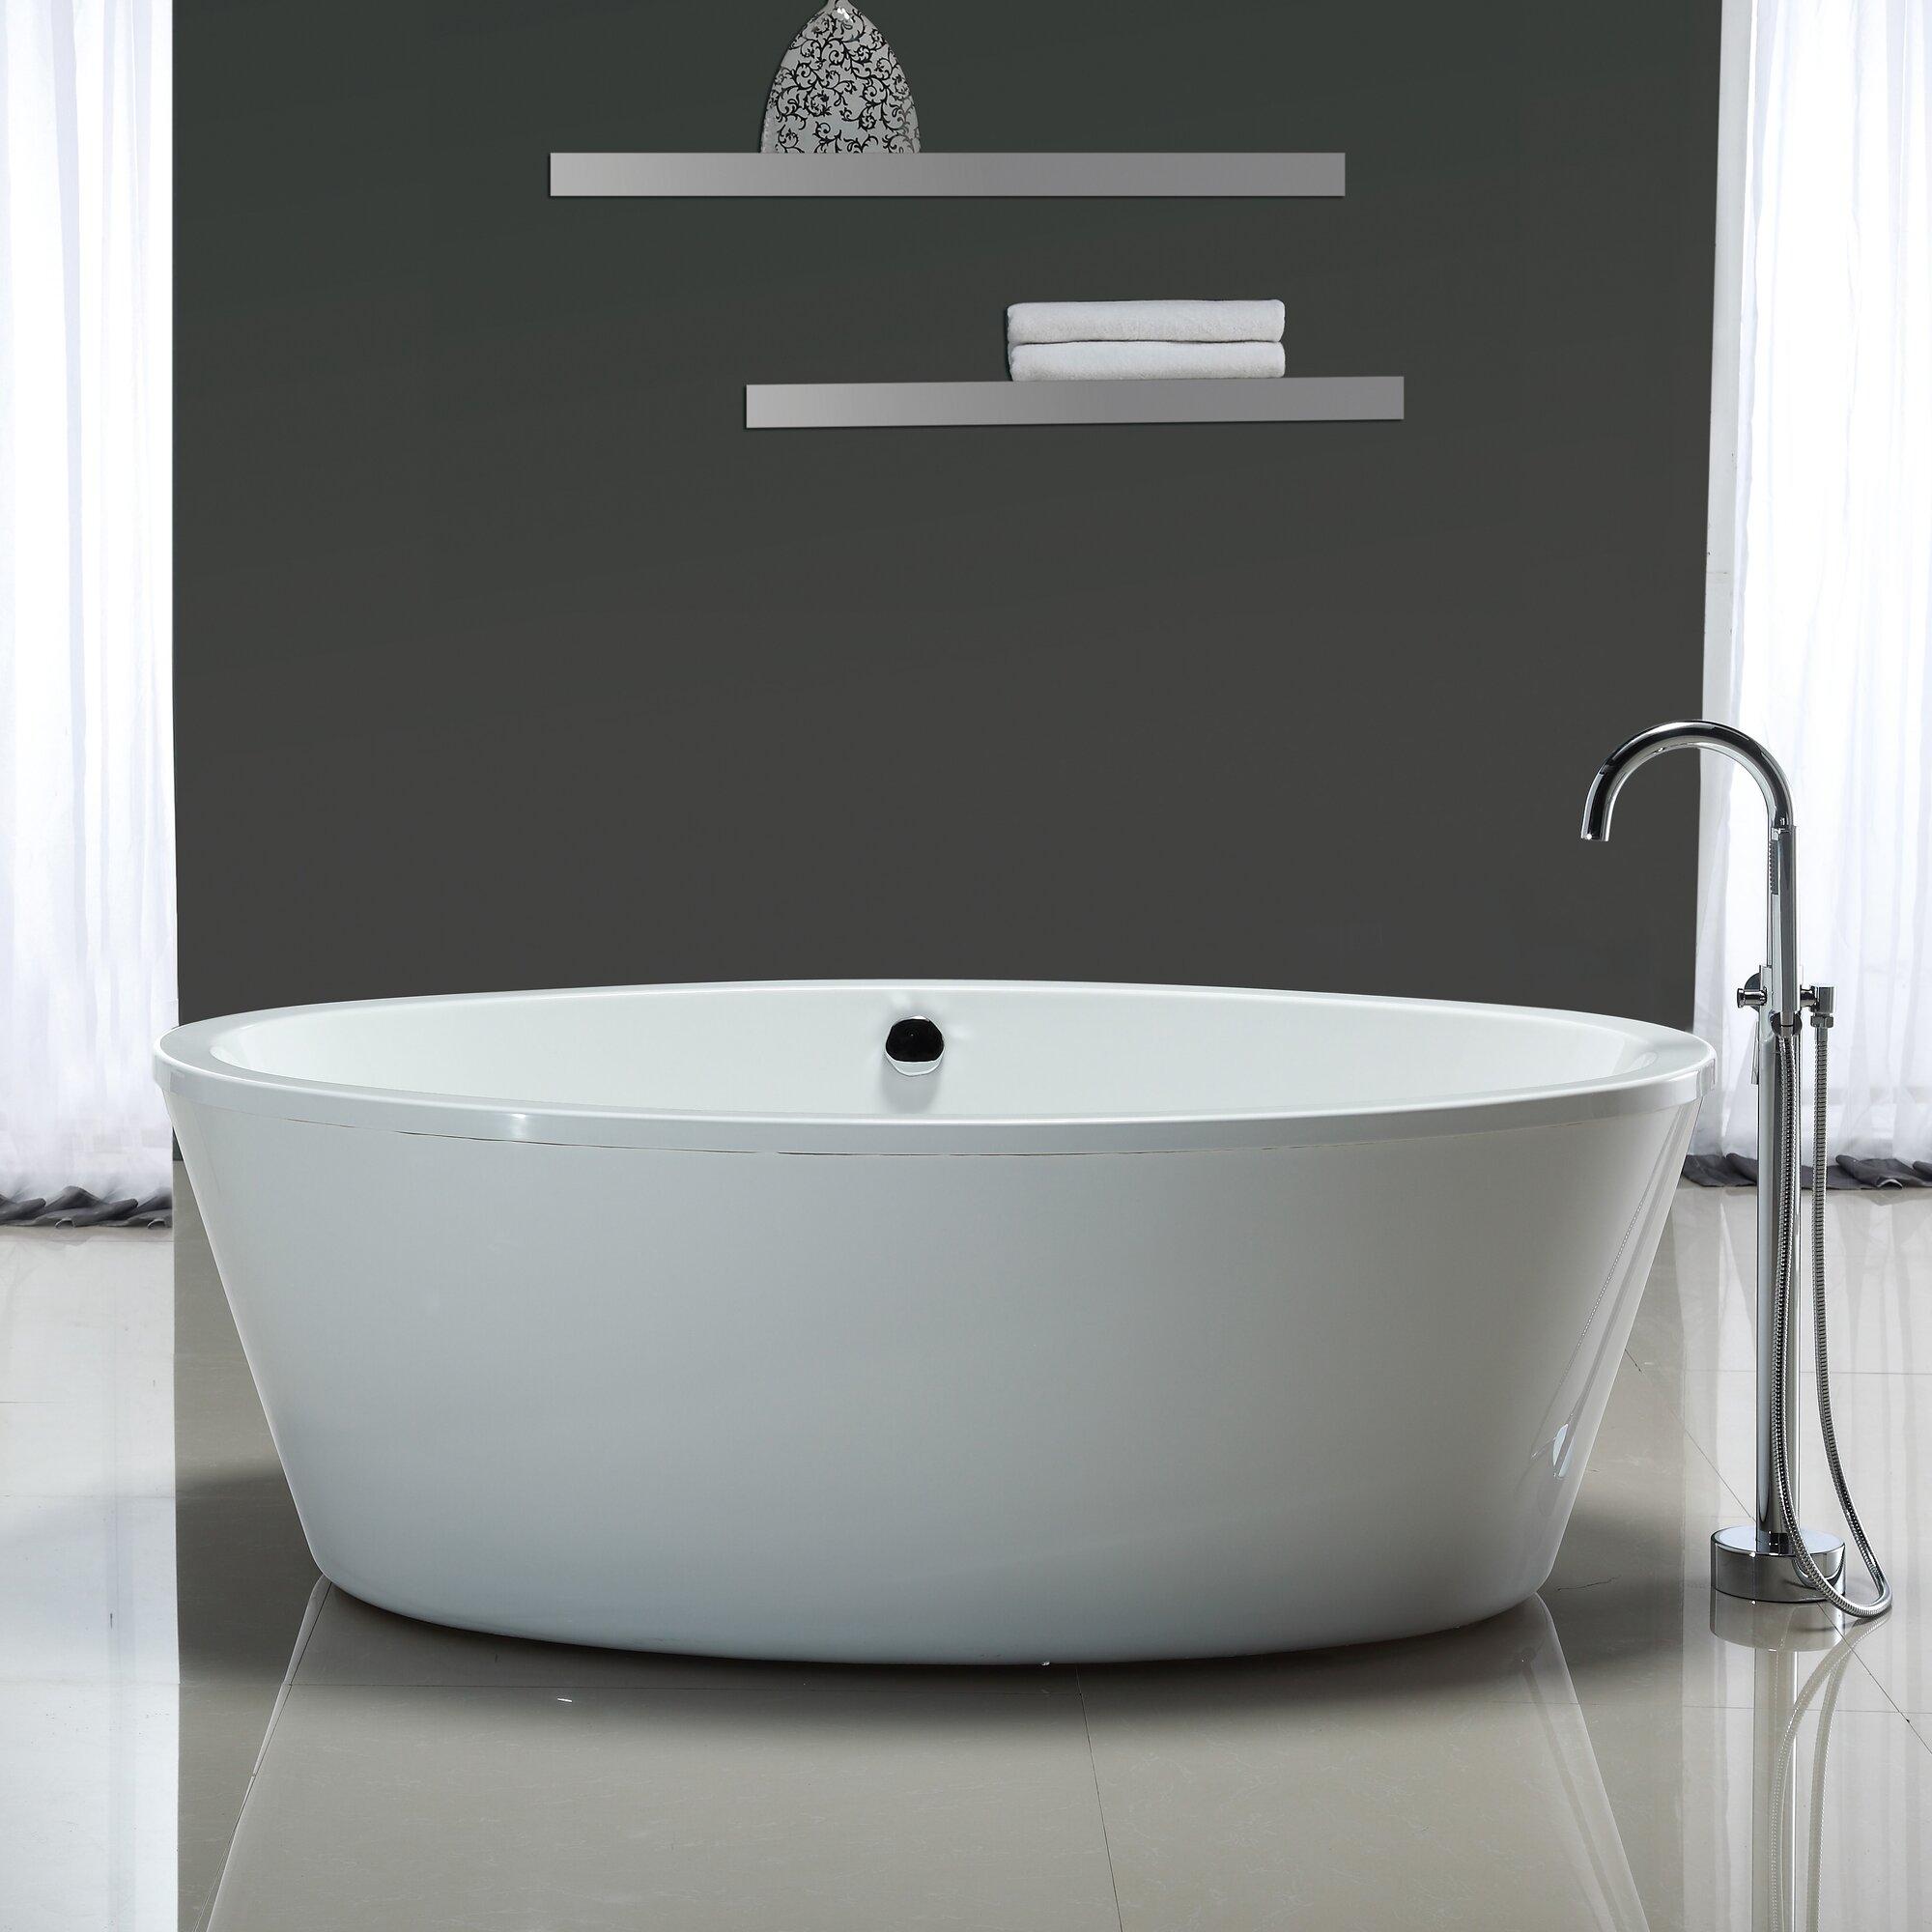 marilyn 67 x 43 soaking bathtub - Ove Decors